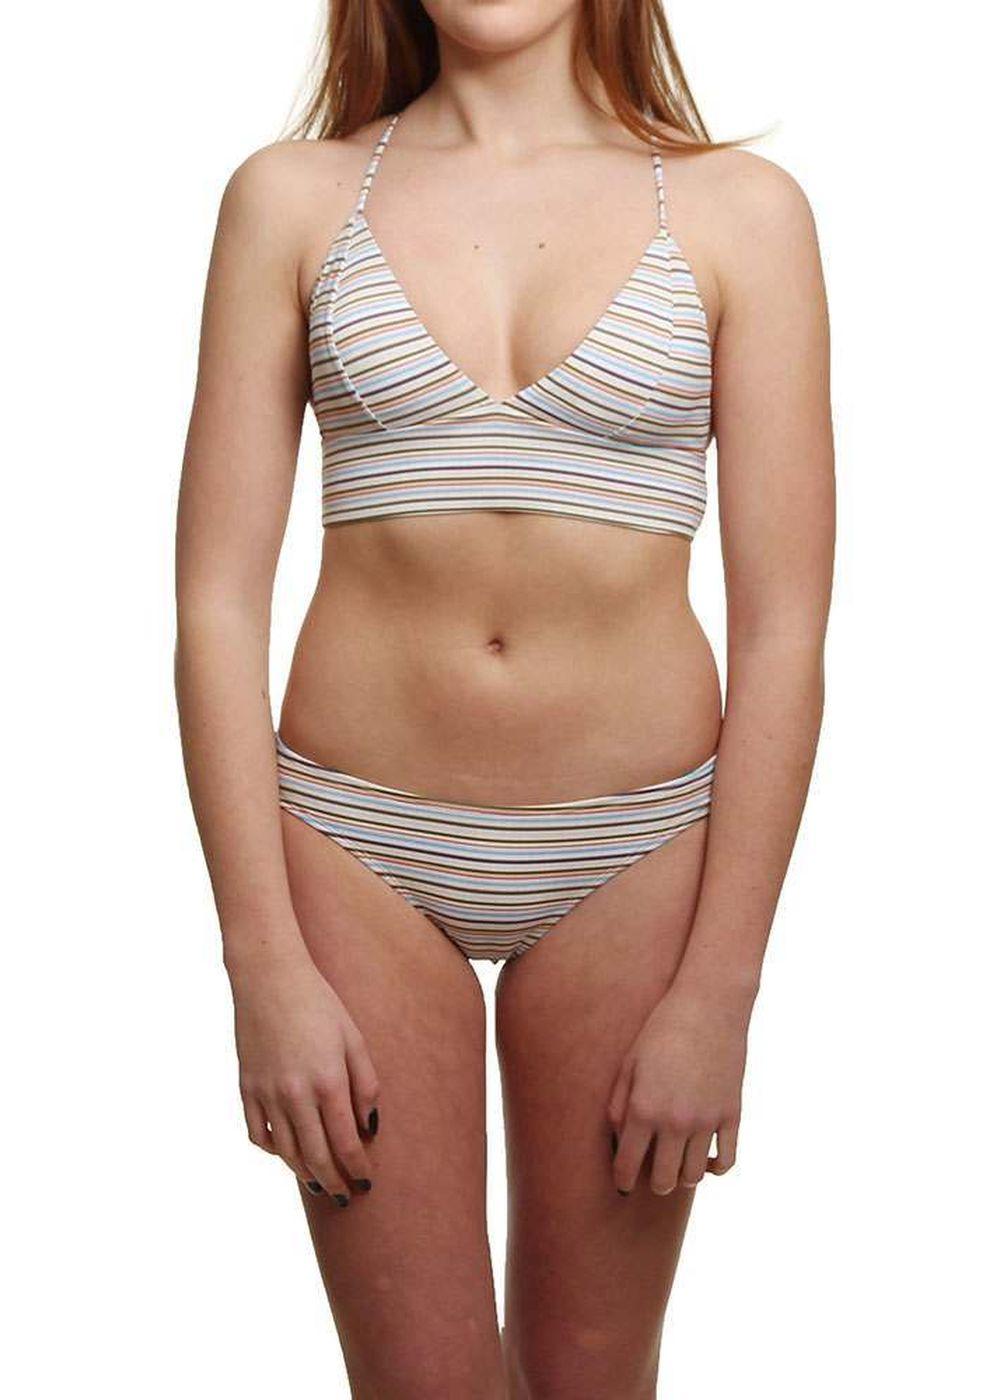 pukas-regular-tri-bikini-multi-stripes